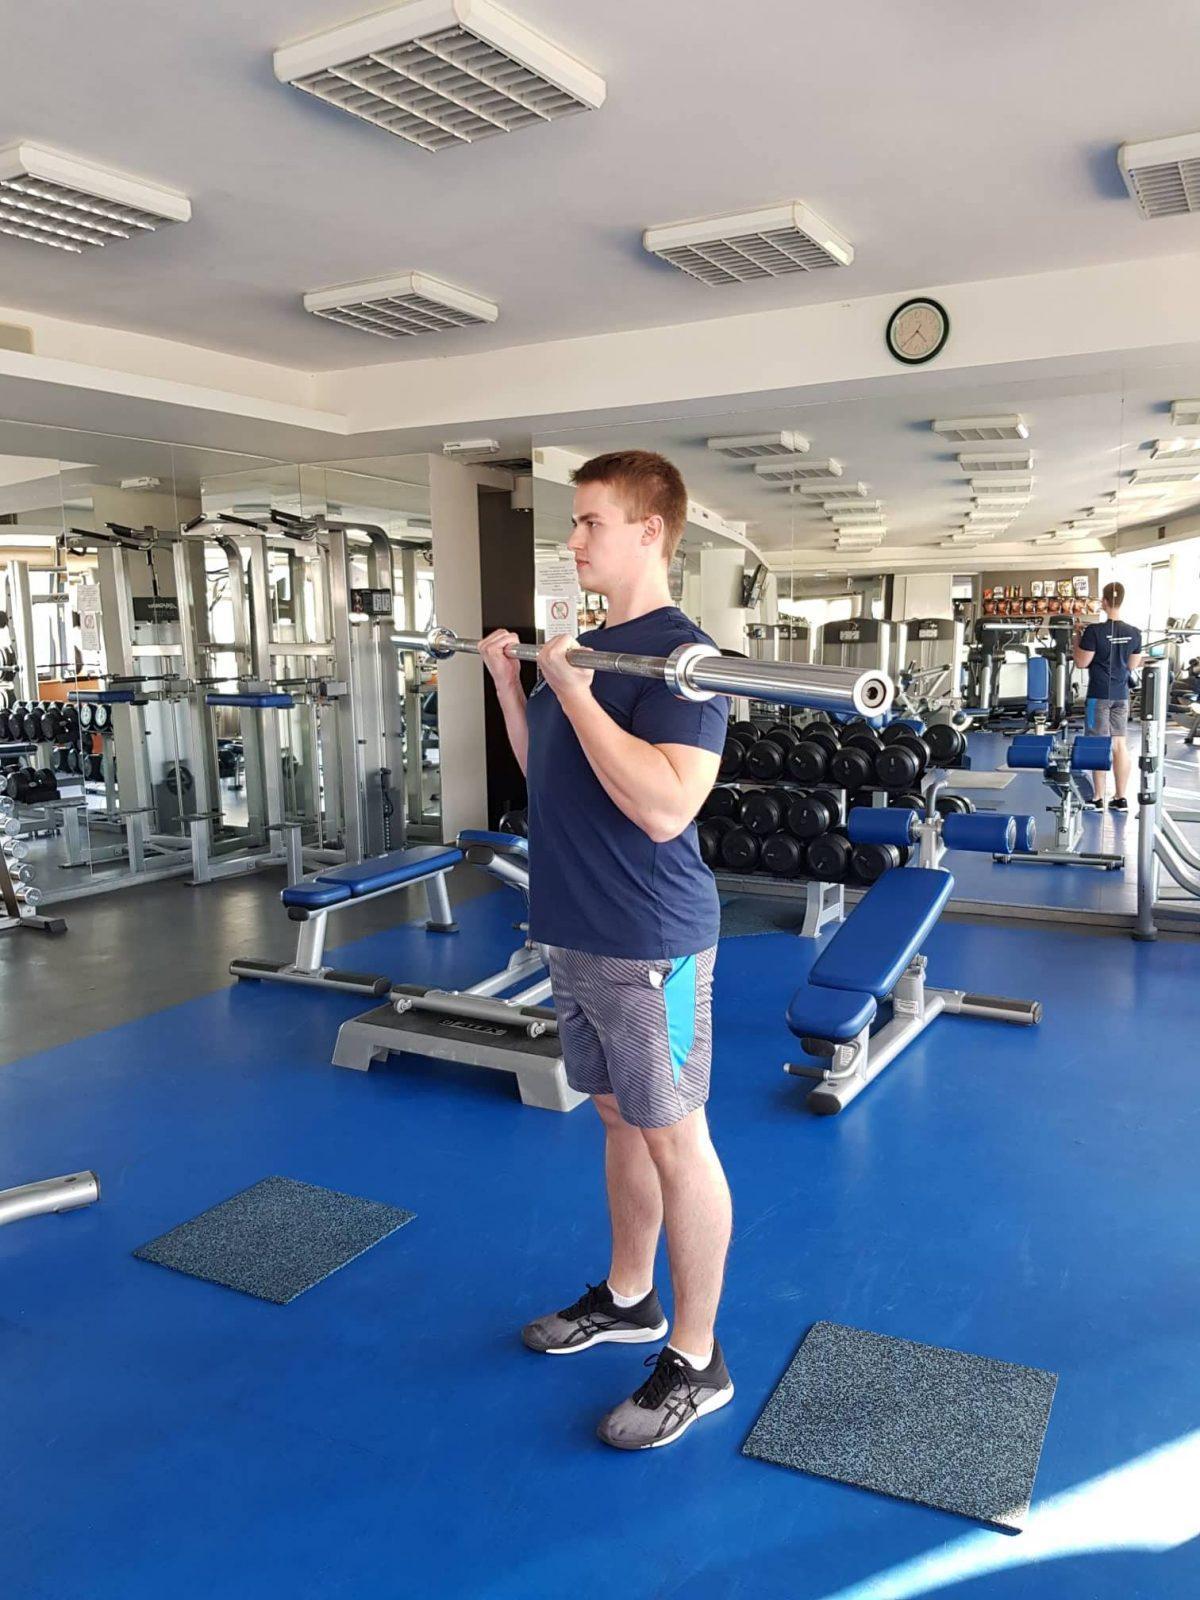 Bicepsový zdvih s obojručnou činkou